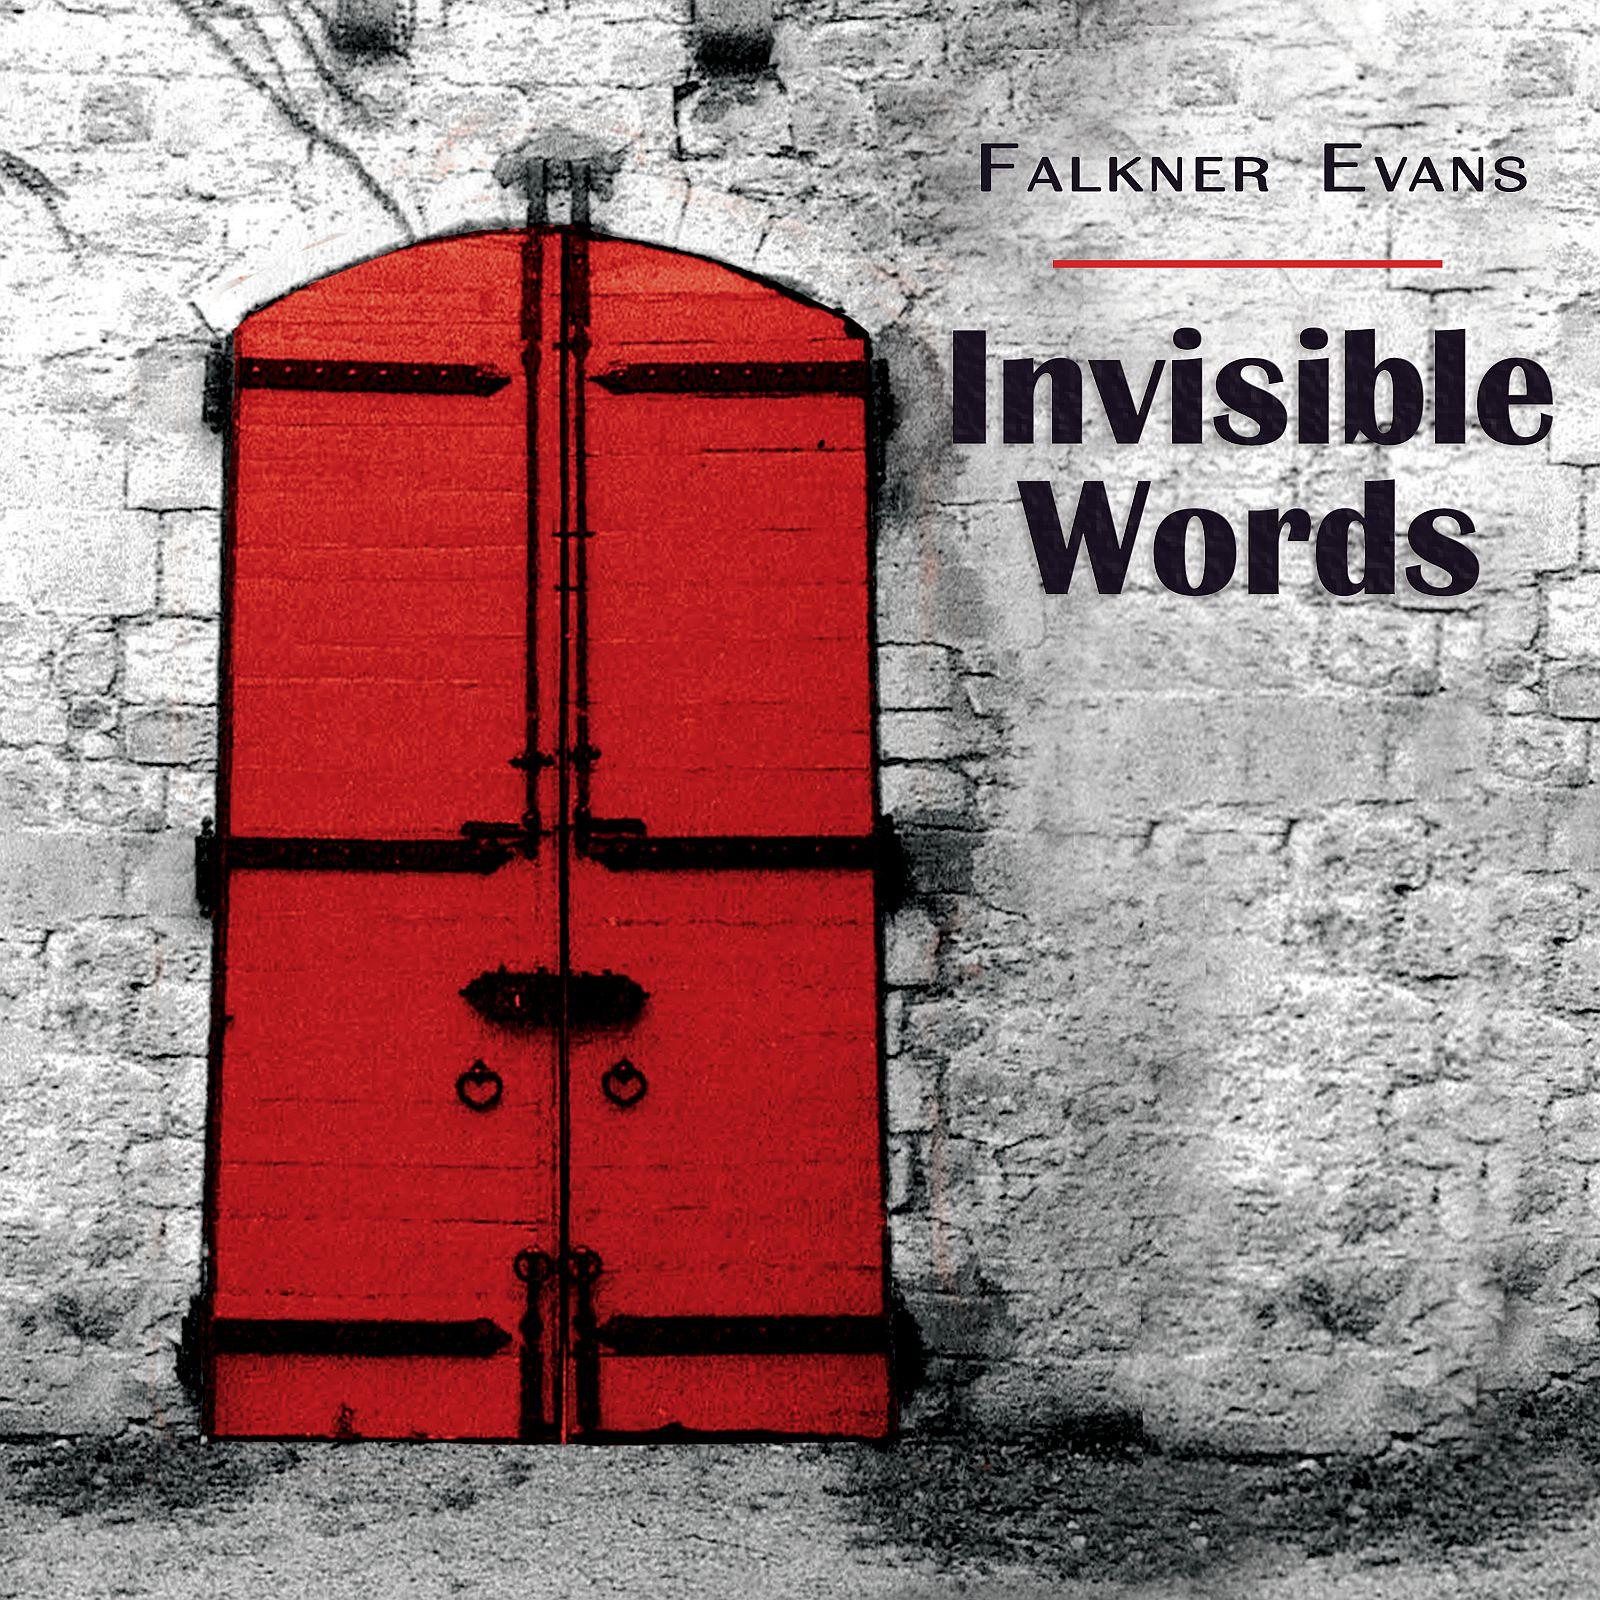 CD_Cover_Falkner_Evans_Invisible_Words_1600pix